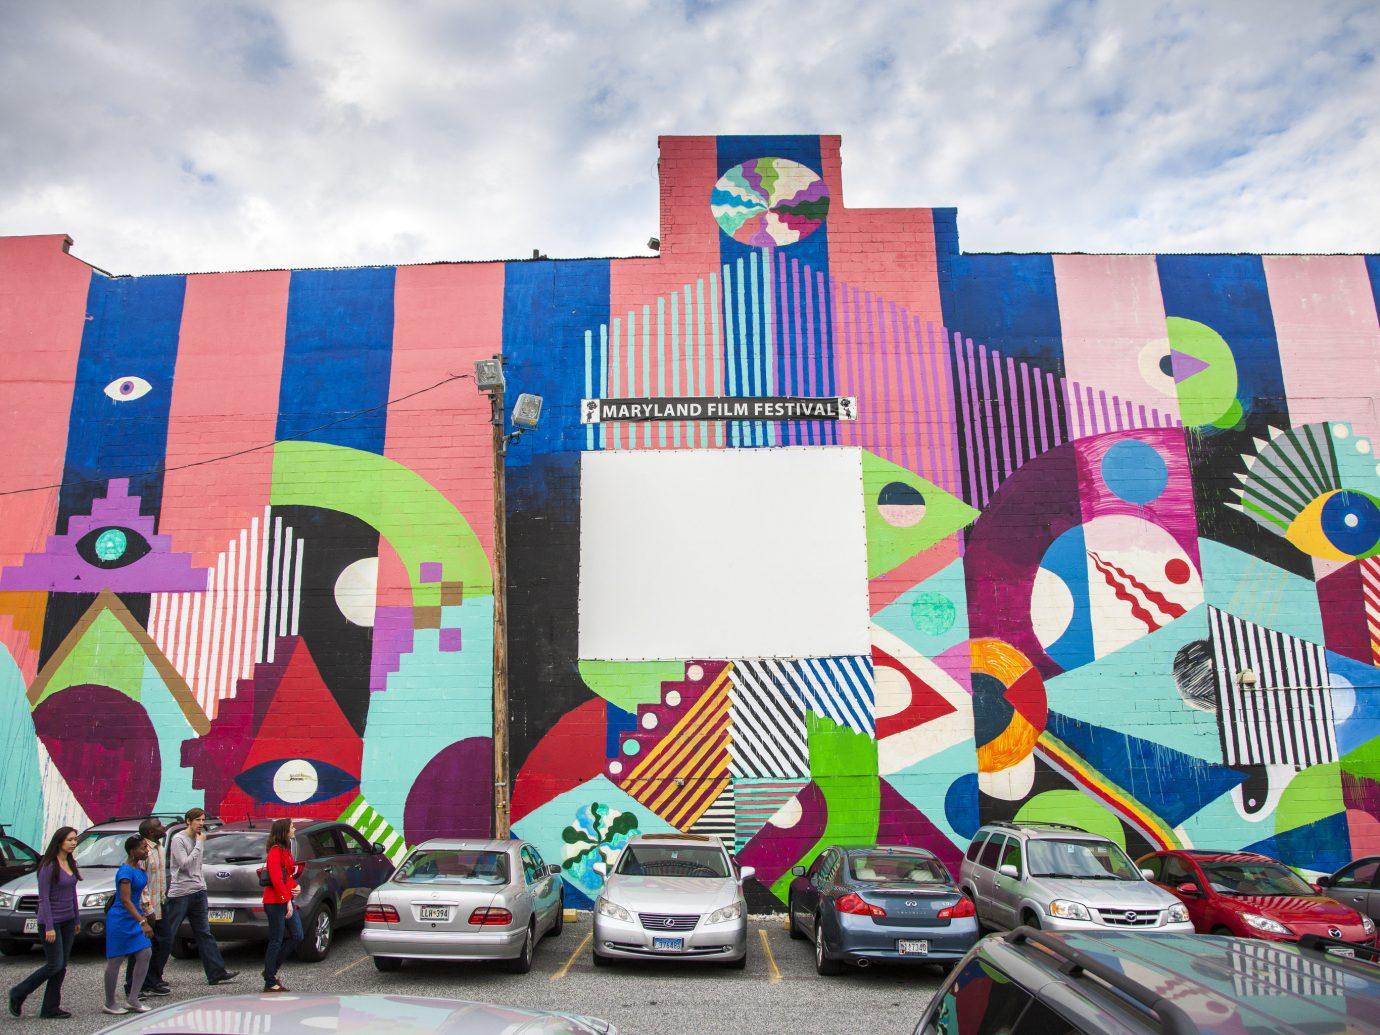 Romance Trip Ideas Weekend Getaways sky mural art wall street art graffiti flag colorful artwork